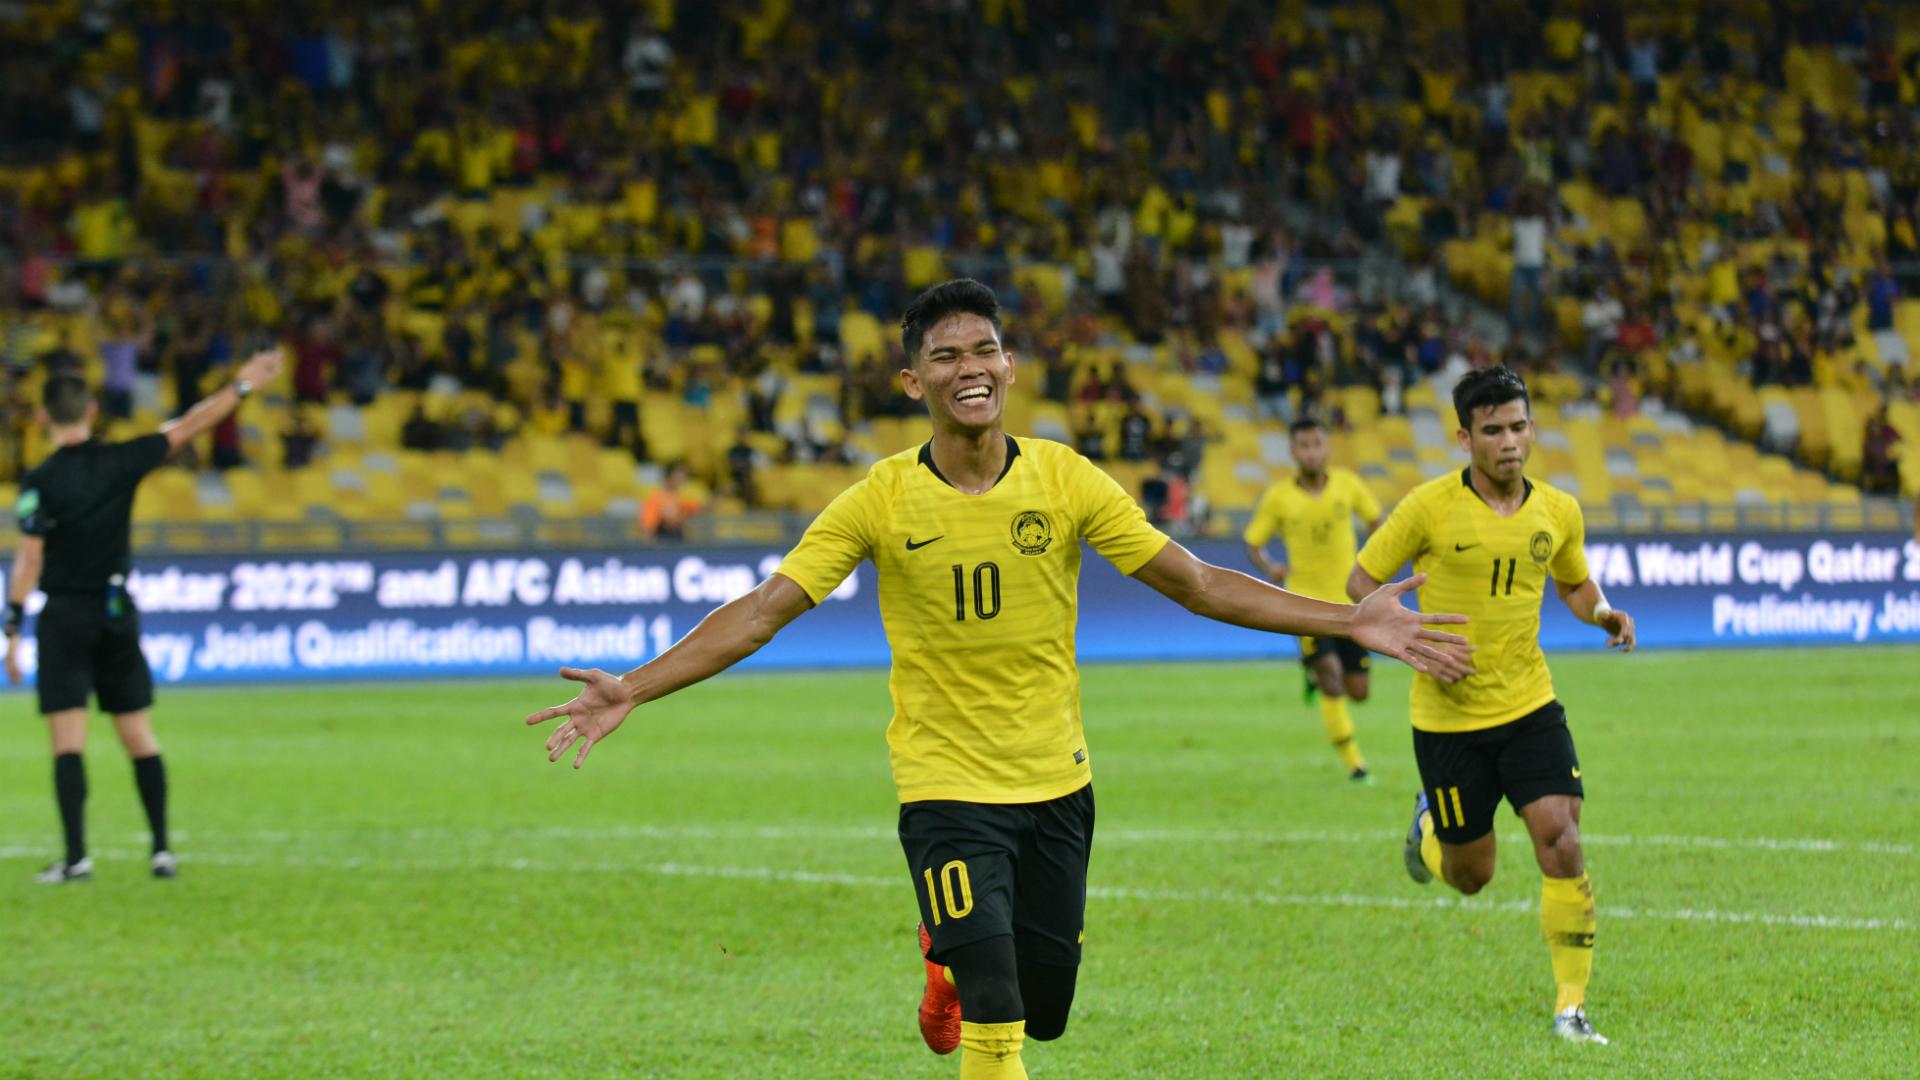 Shahrel Fikri, Malaysia v Timor Leste, 2022 World Cup Qualification, 7 Jun 2019